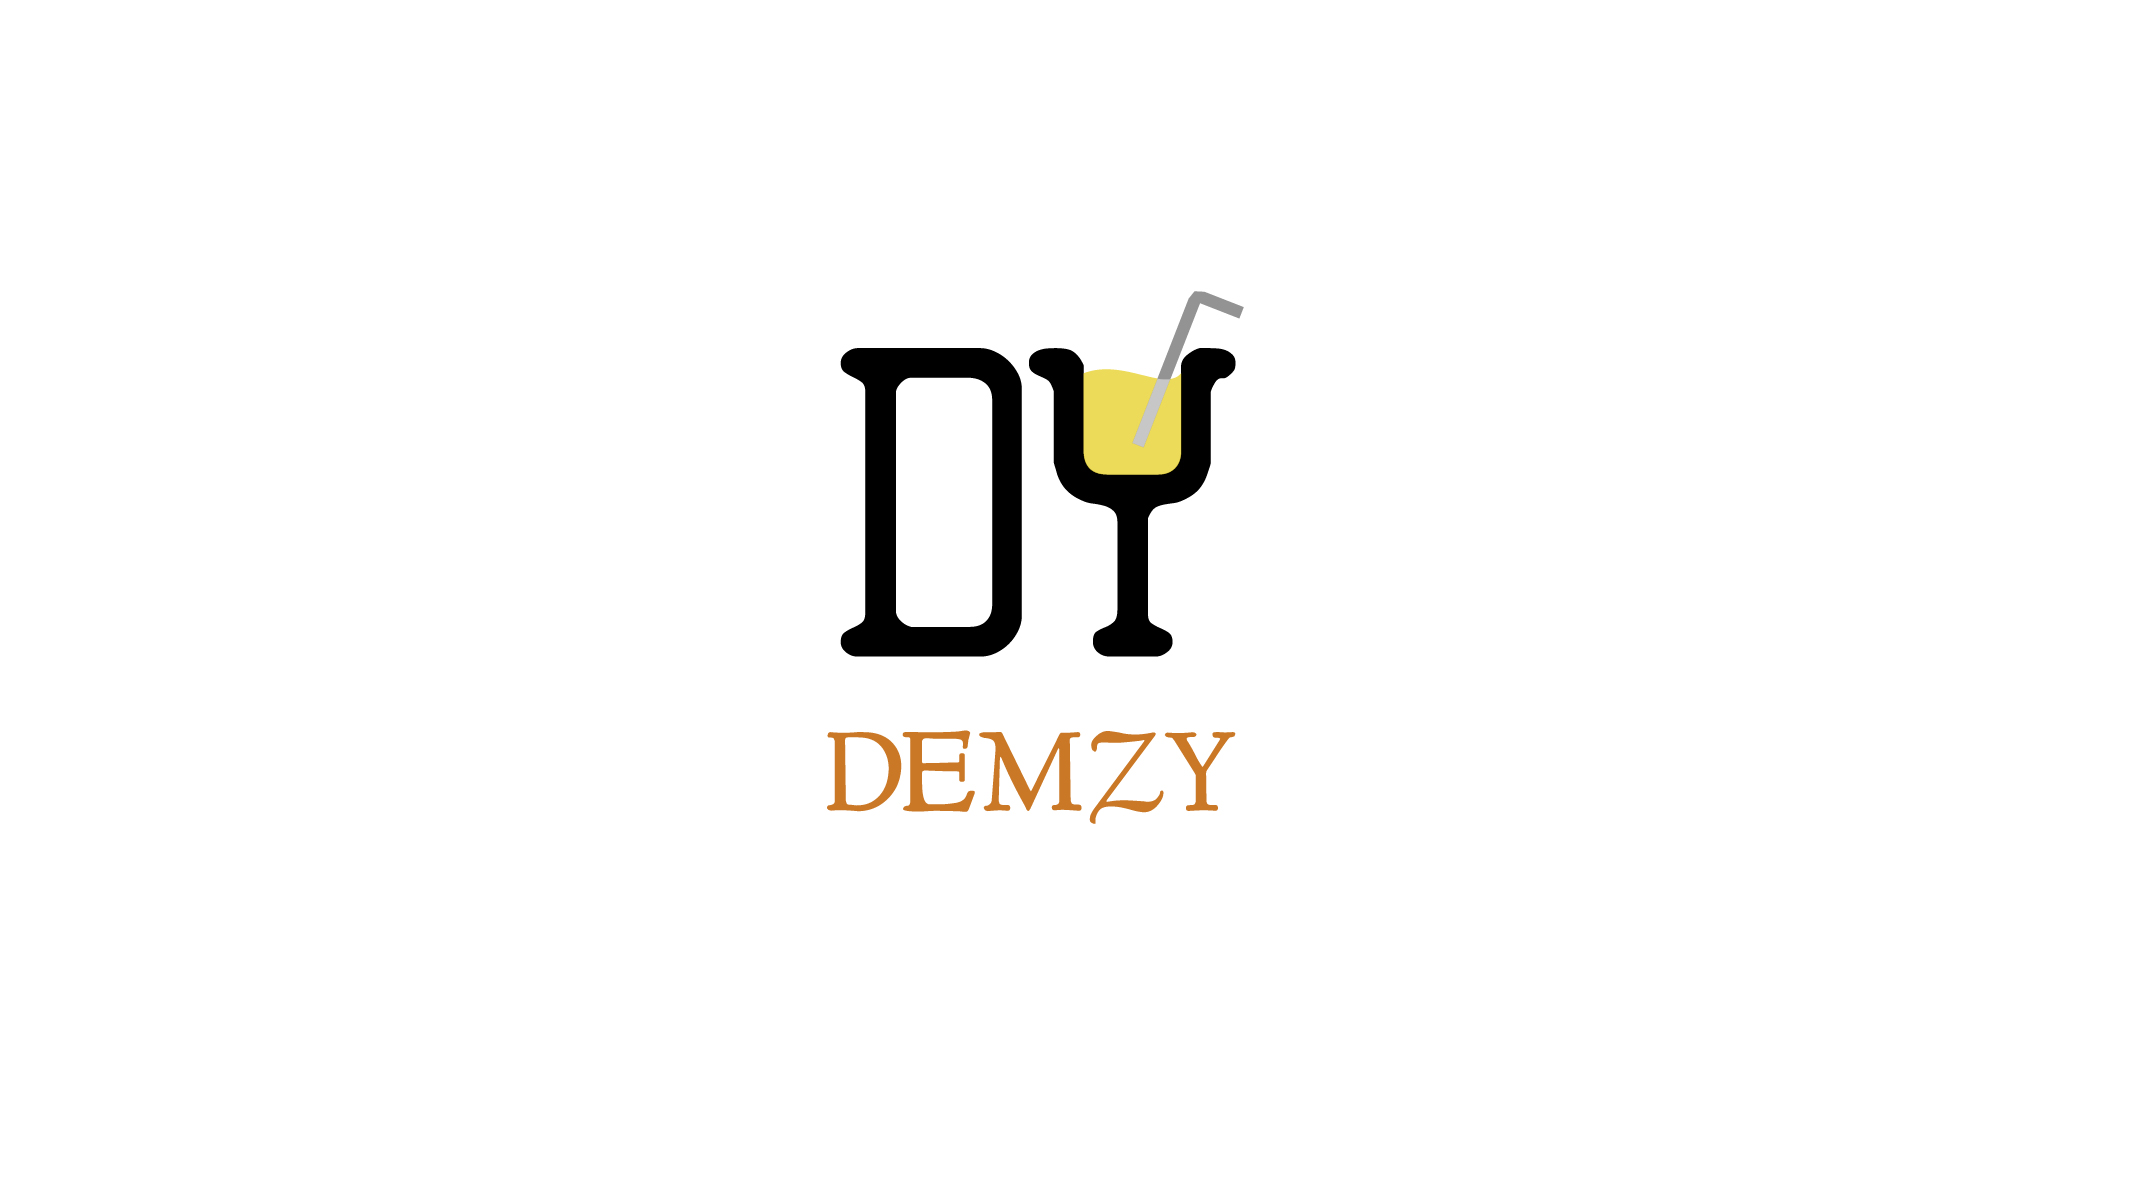 DEMZY